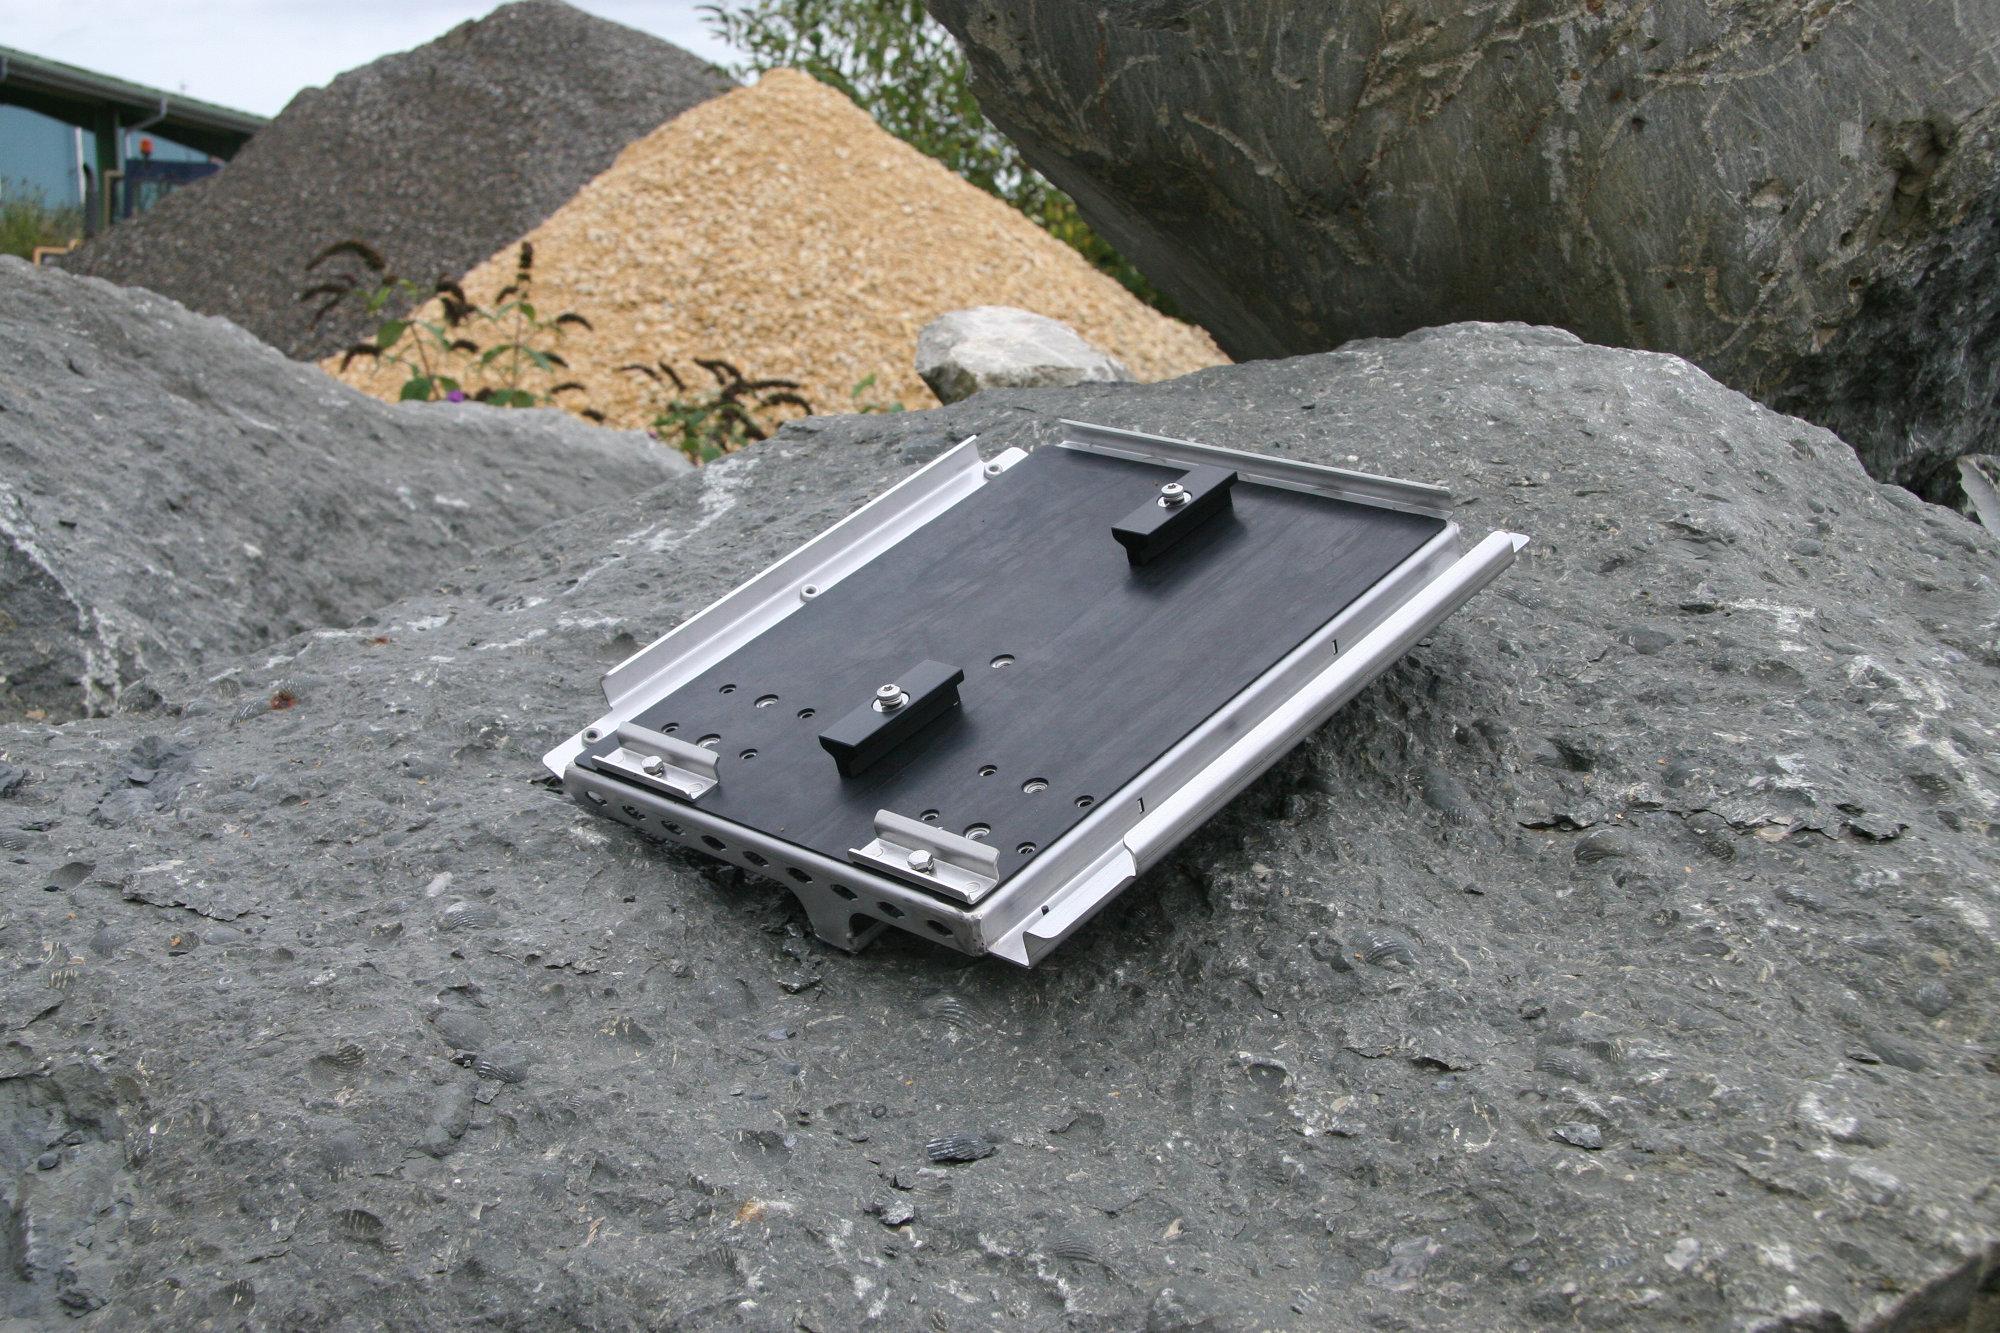 Doppelbatterietraeger Doppelbatteriehalterung Land Rover Defender.000